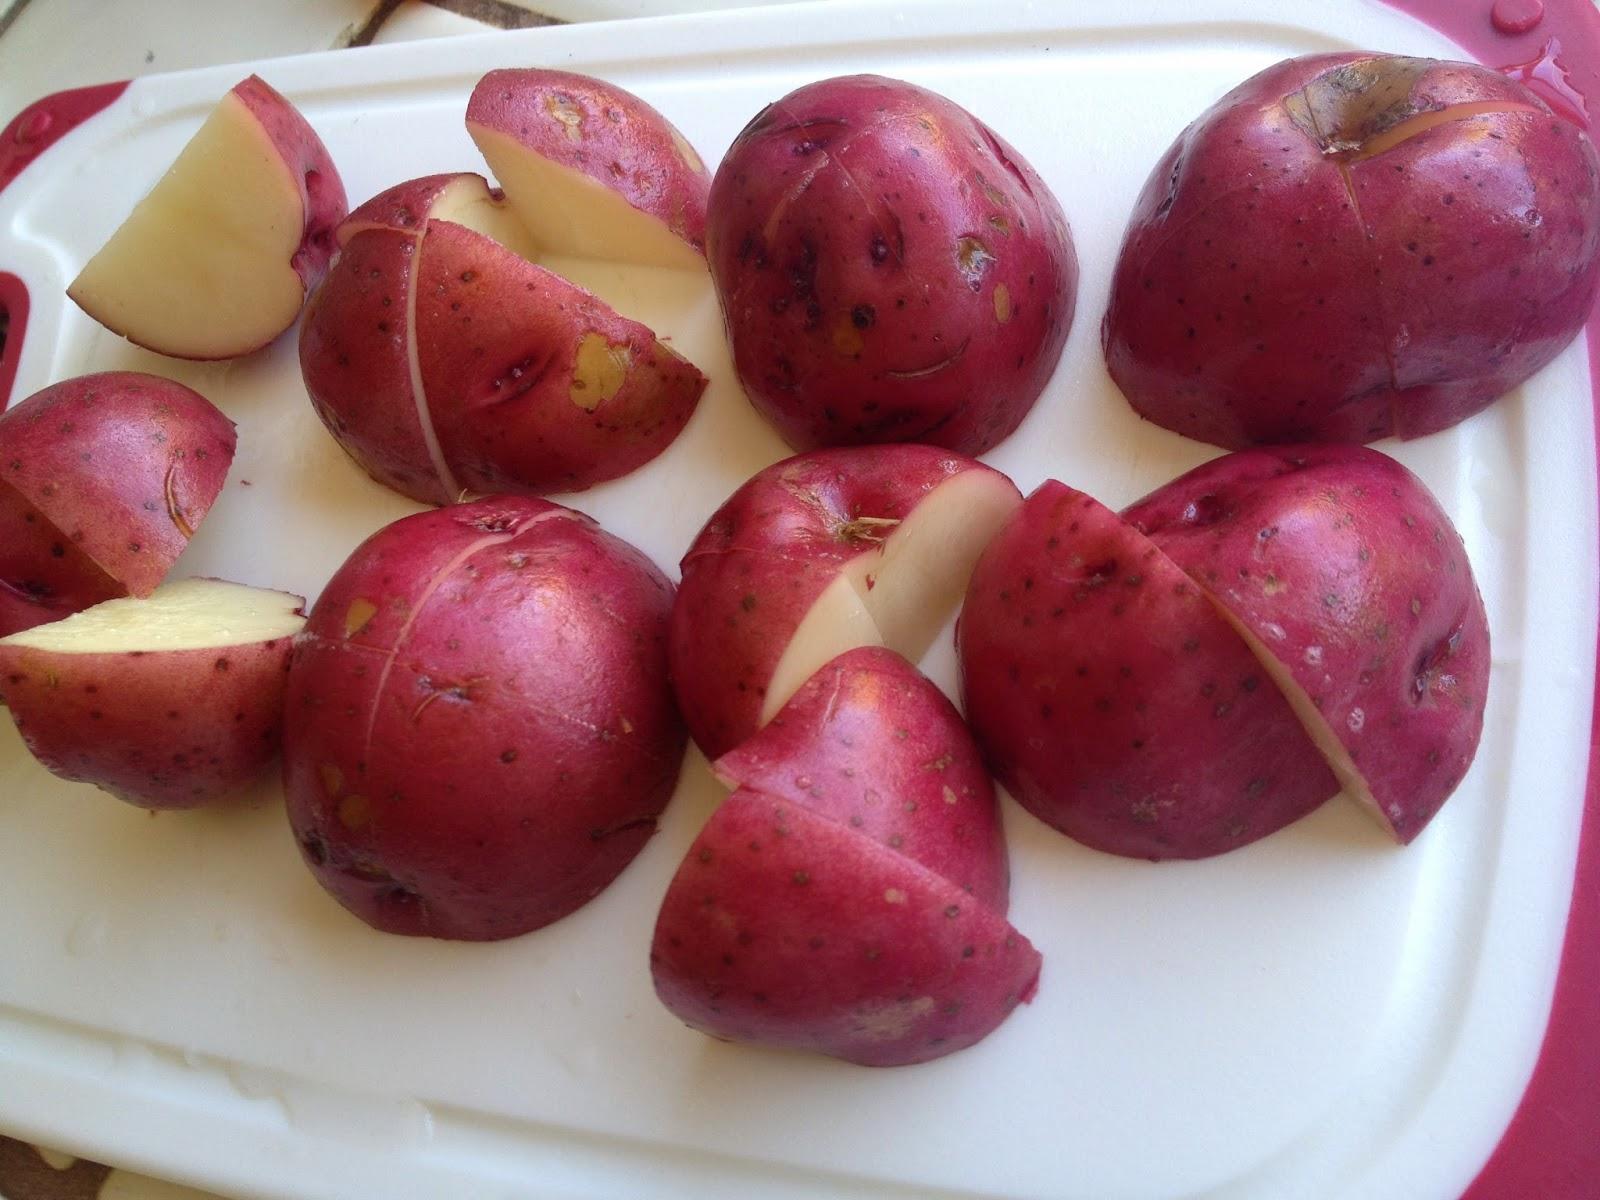 red potatoes fresh cut